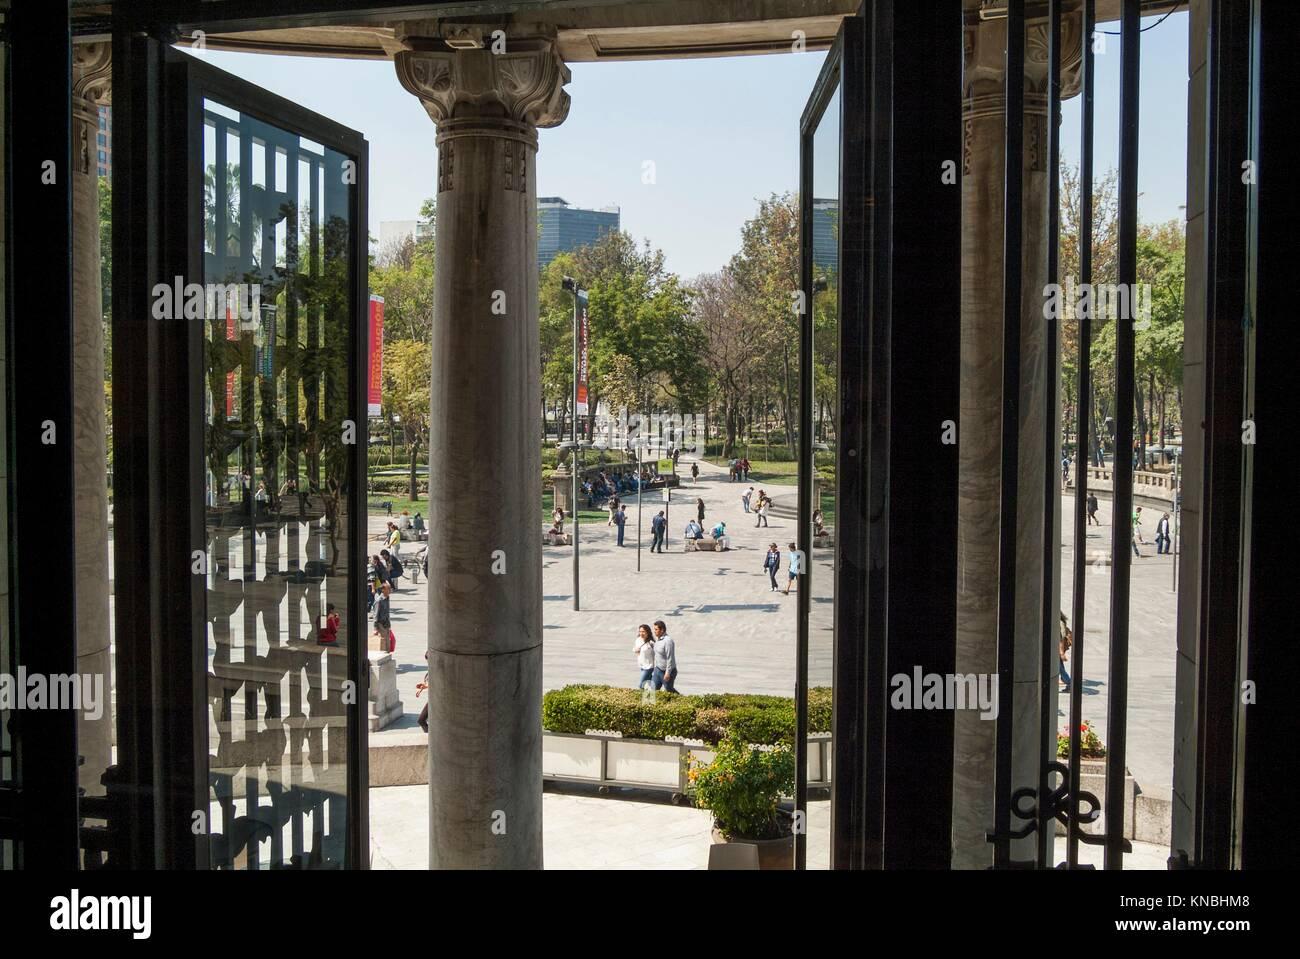 View from the dining room of the Palacio de Bellas Artes in Mexico City, Mexico toward Alameda park. - Stock Image